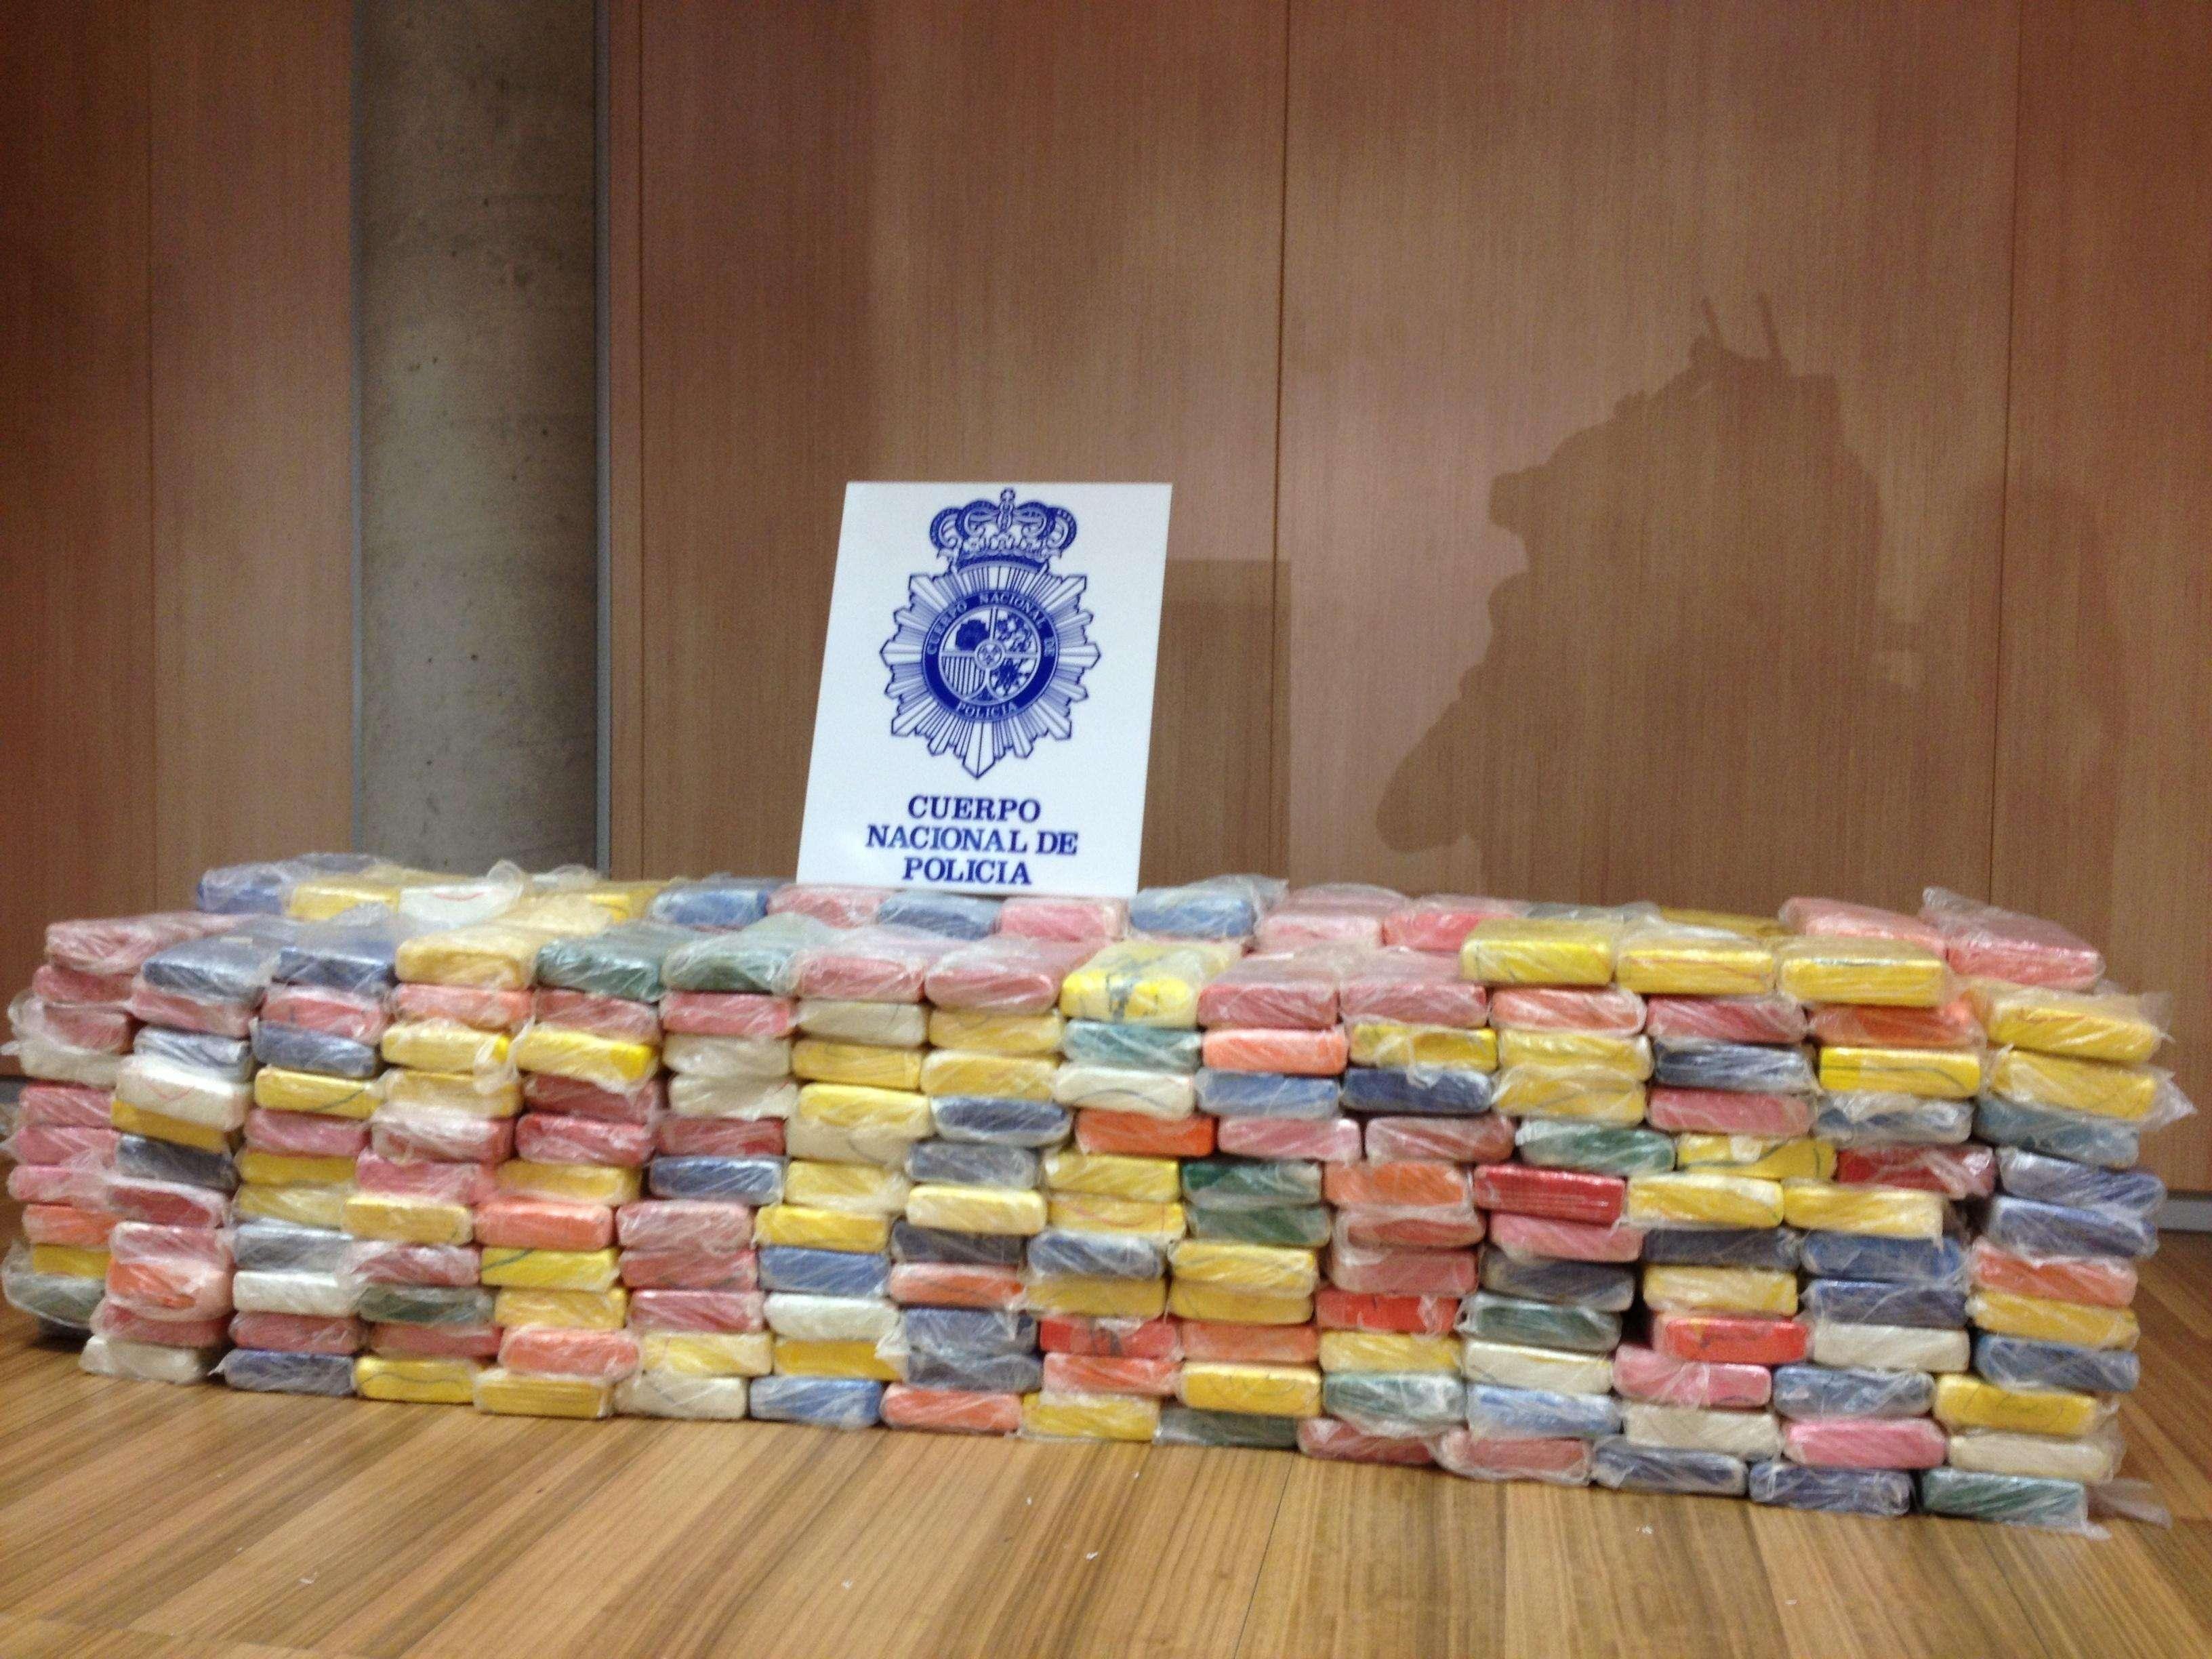 Cocaína (373 kilos) intervenida en España al cartel Sinaloa Foto: EUROPA PRESS